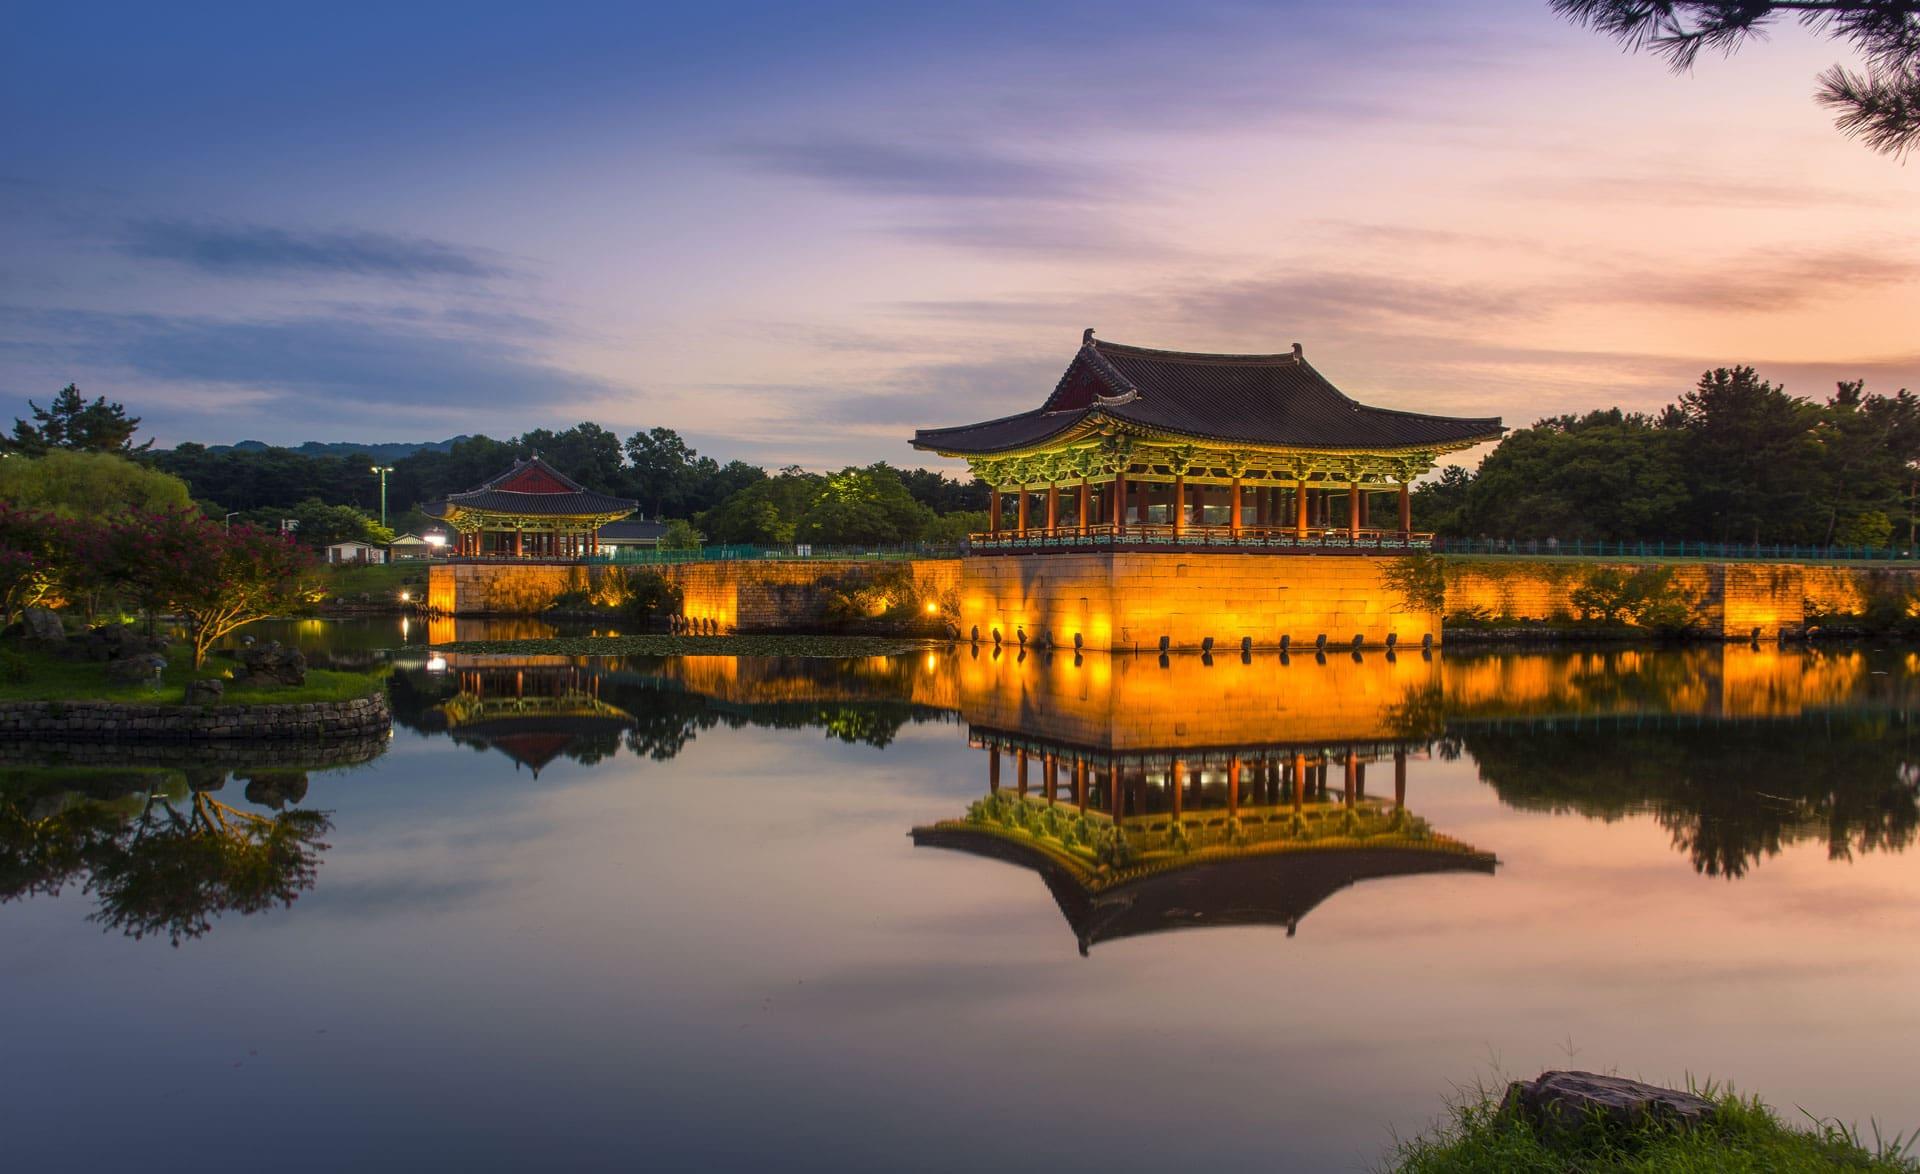 Sunset on Wolji pond Gyeongju South Korea